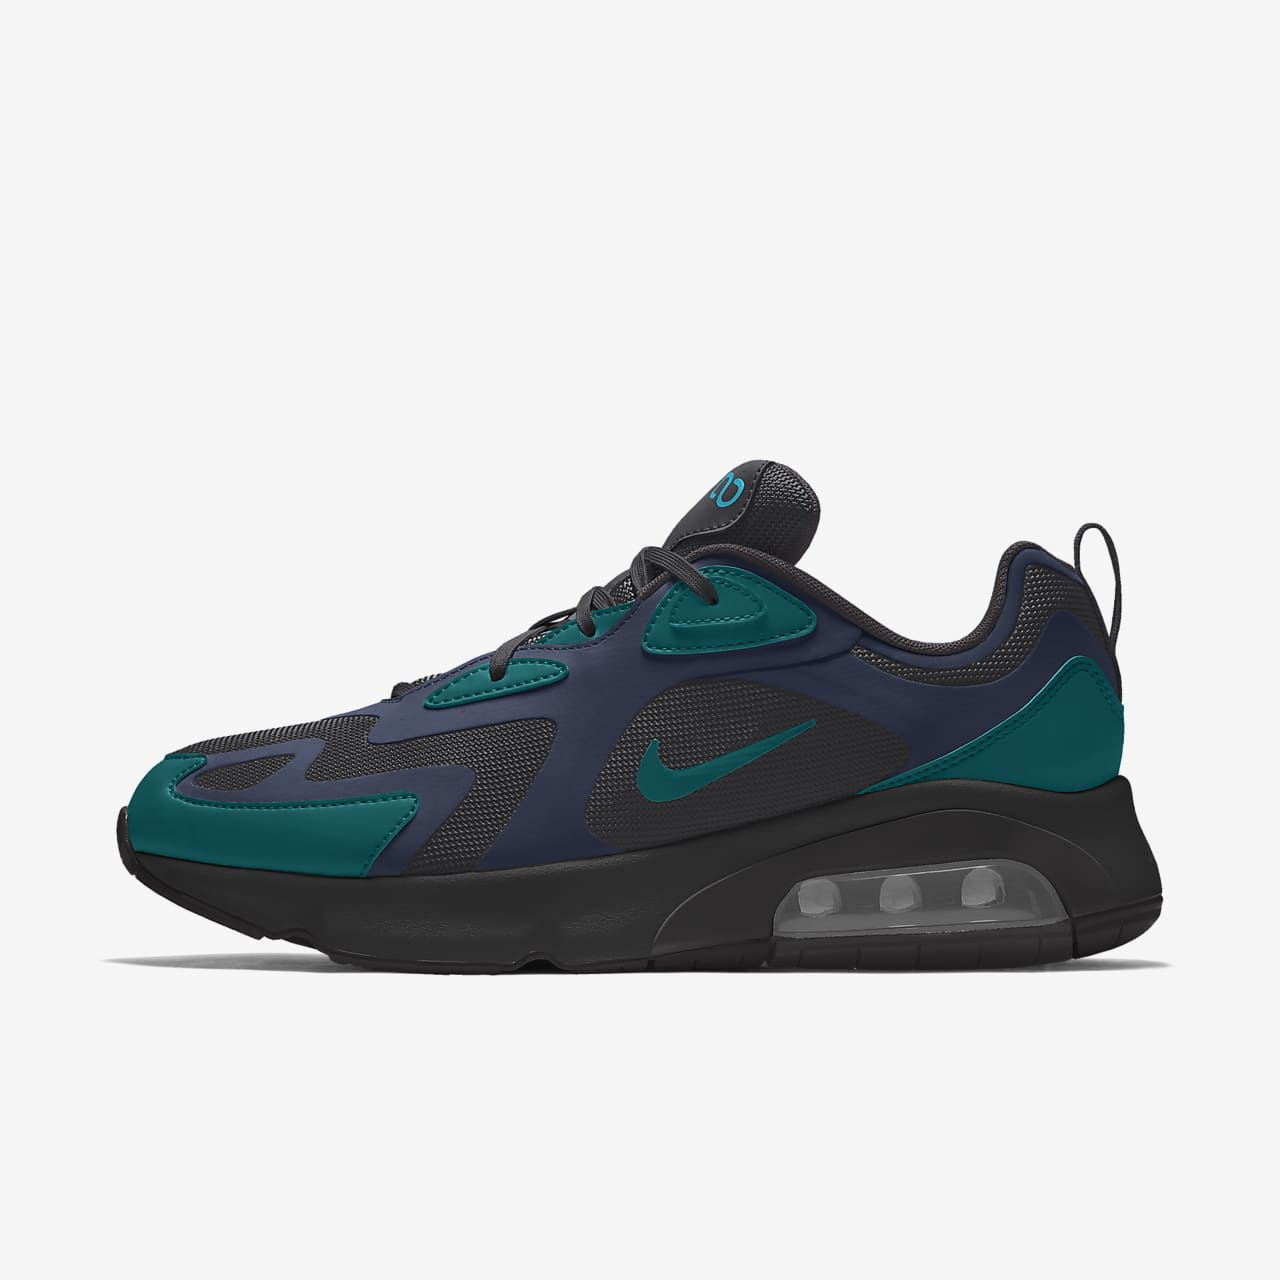 Nike Air Max 200 By You Custom Men's Shoe